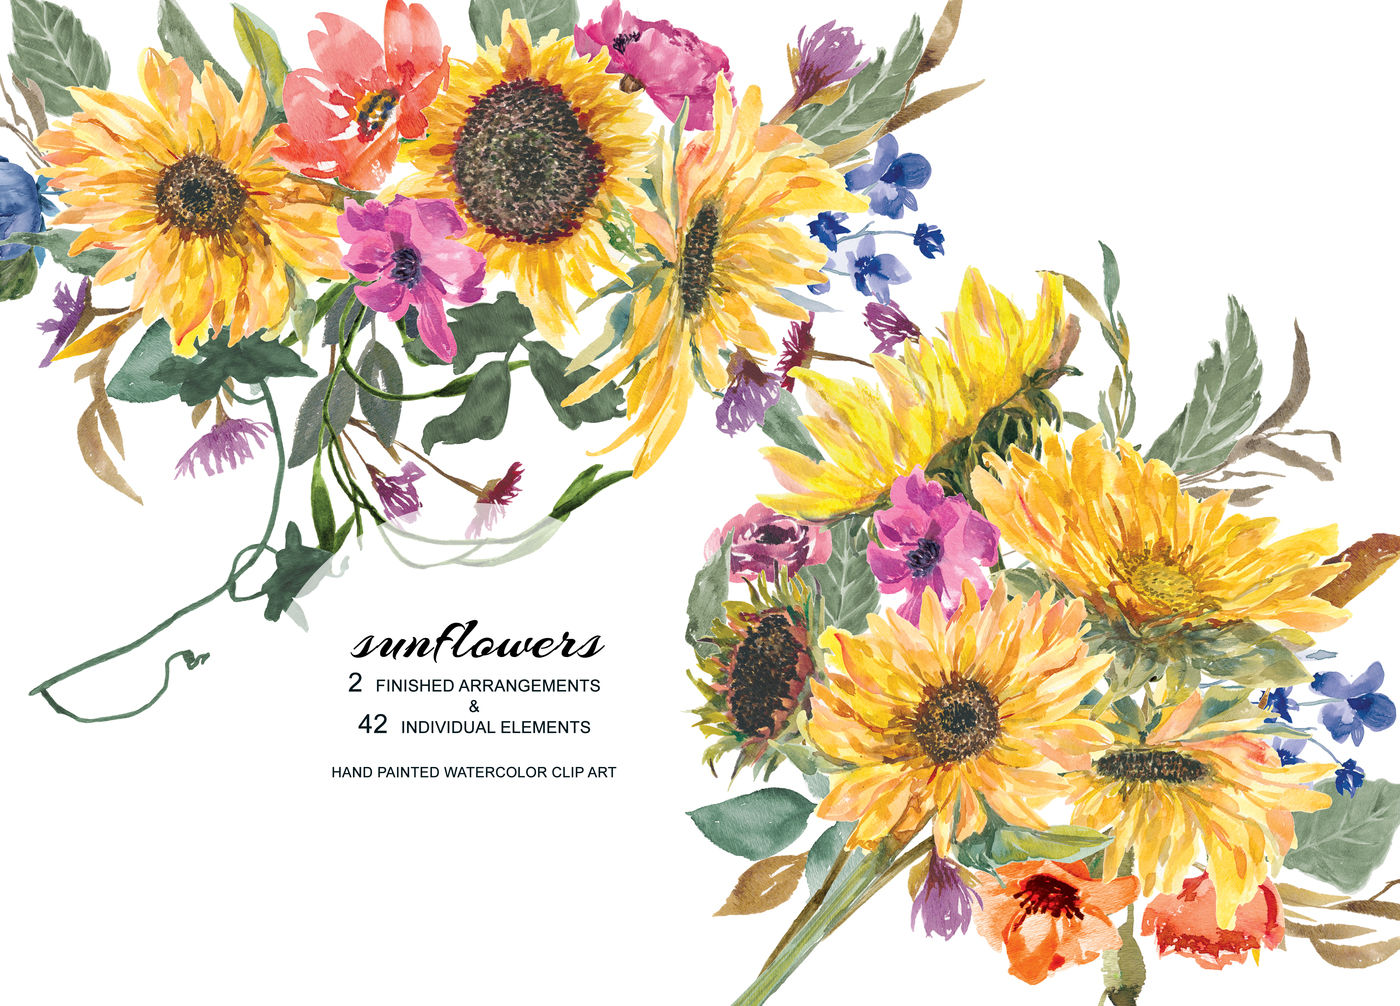 Hand Painted Watercolor Sunflower Clipart Arrangements ...